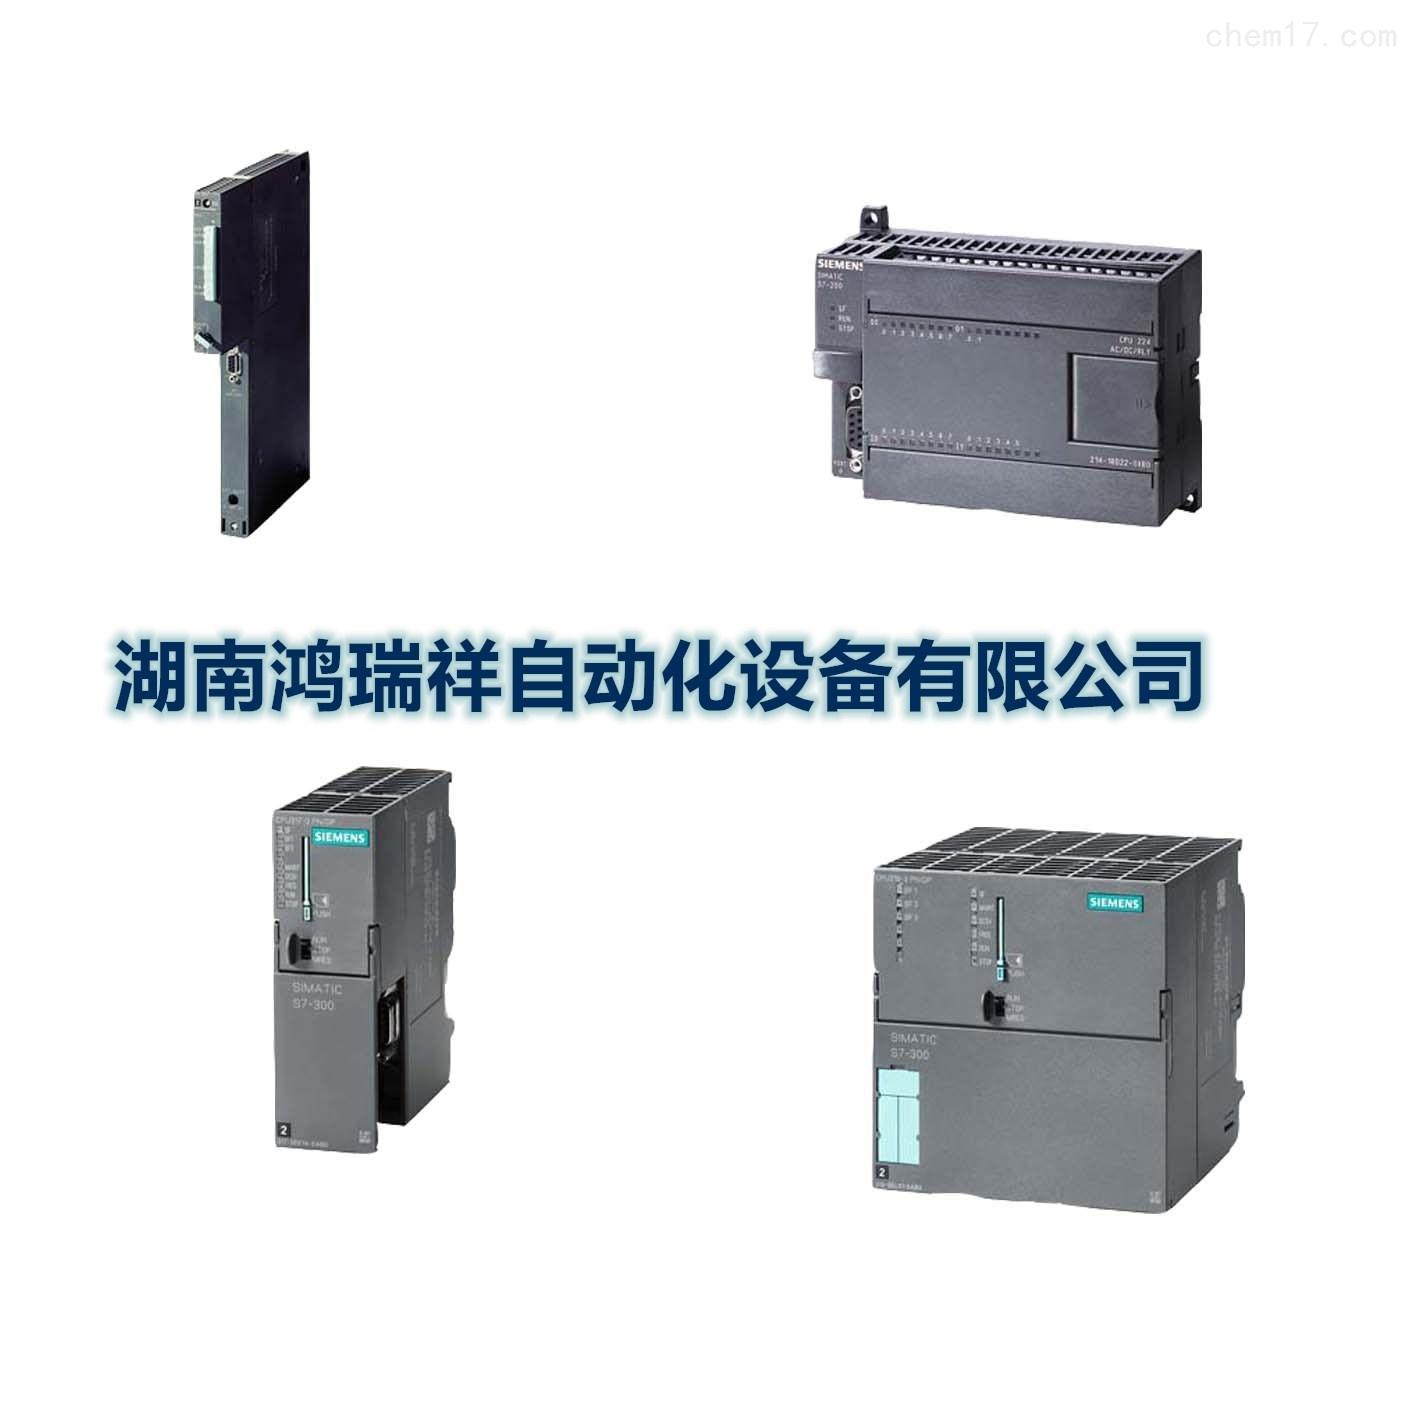 供应6ES7211-1BE40-0XB0